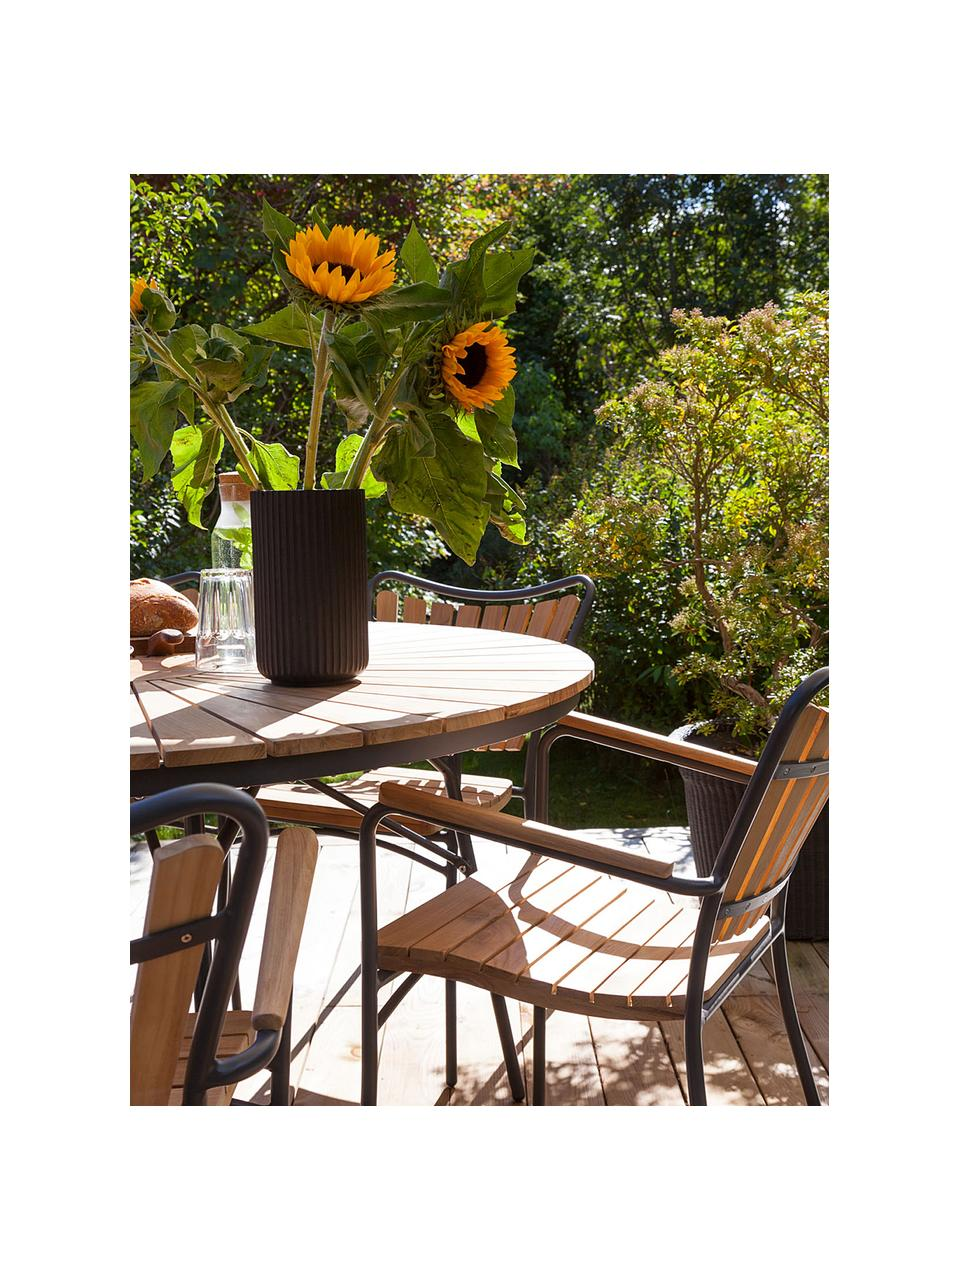 Gartensitzgruppe Ellen, 5-tlg. aus Holz und Metall, Teakholz, geölt Aluminium, pulverbeschichtet, Anthrazit, Teakholz, Sondergrößen